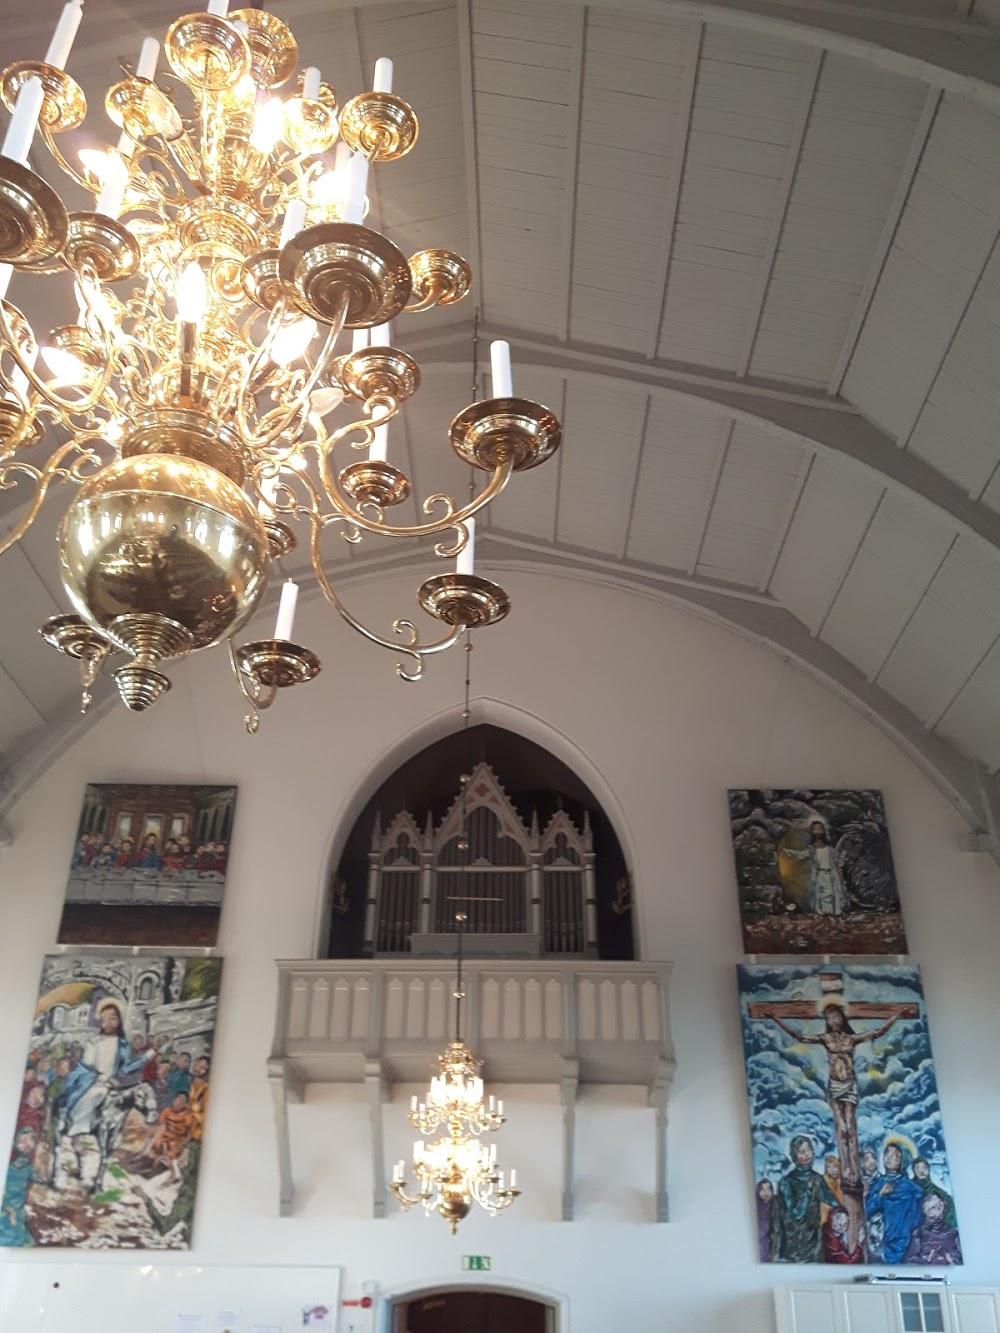 Gamla kyrkan